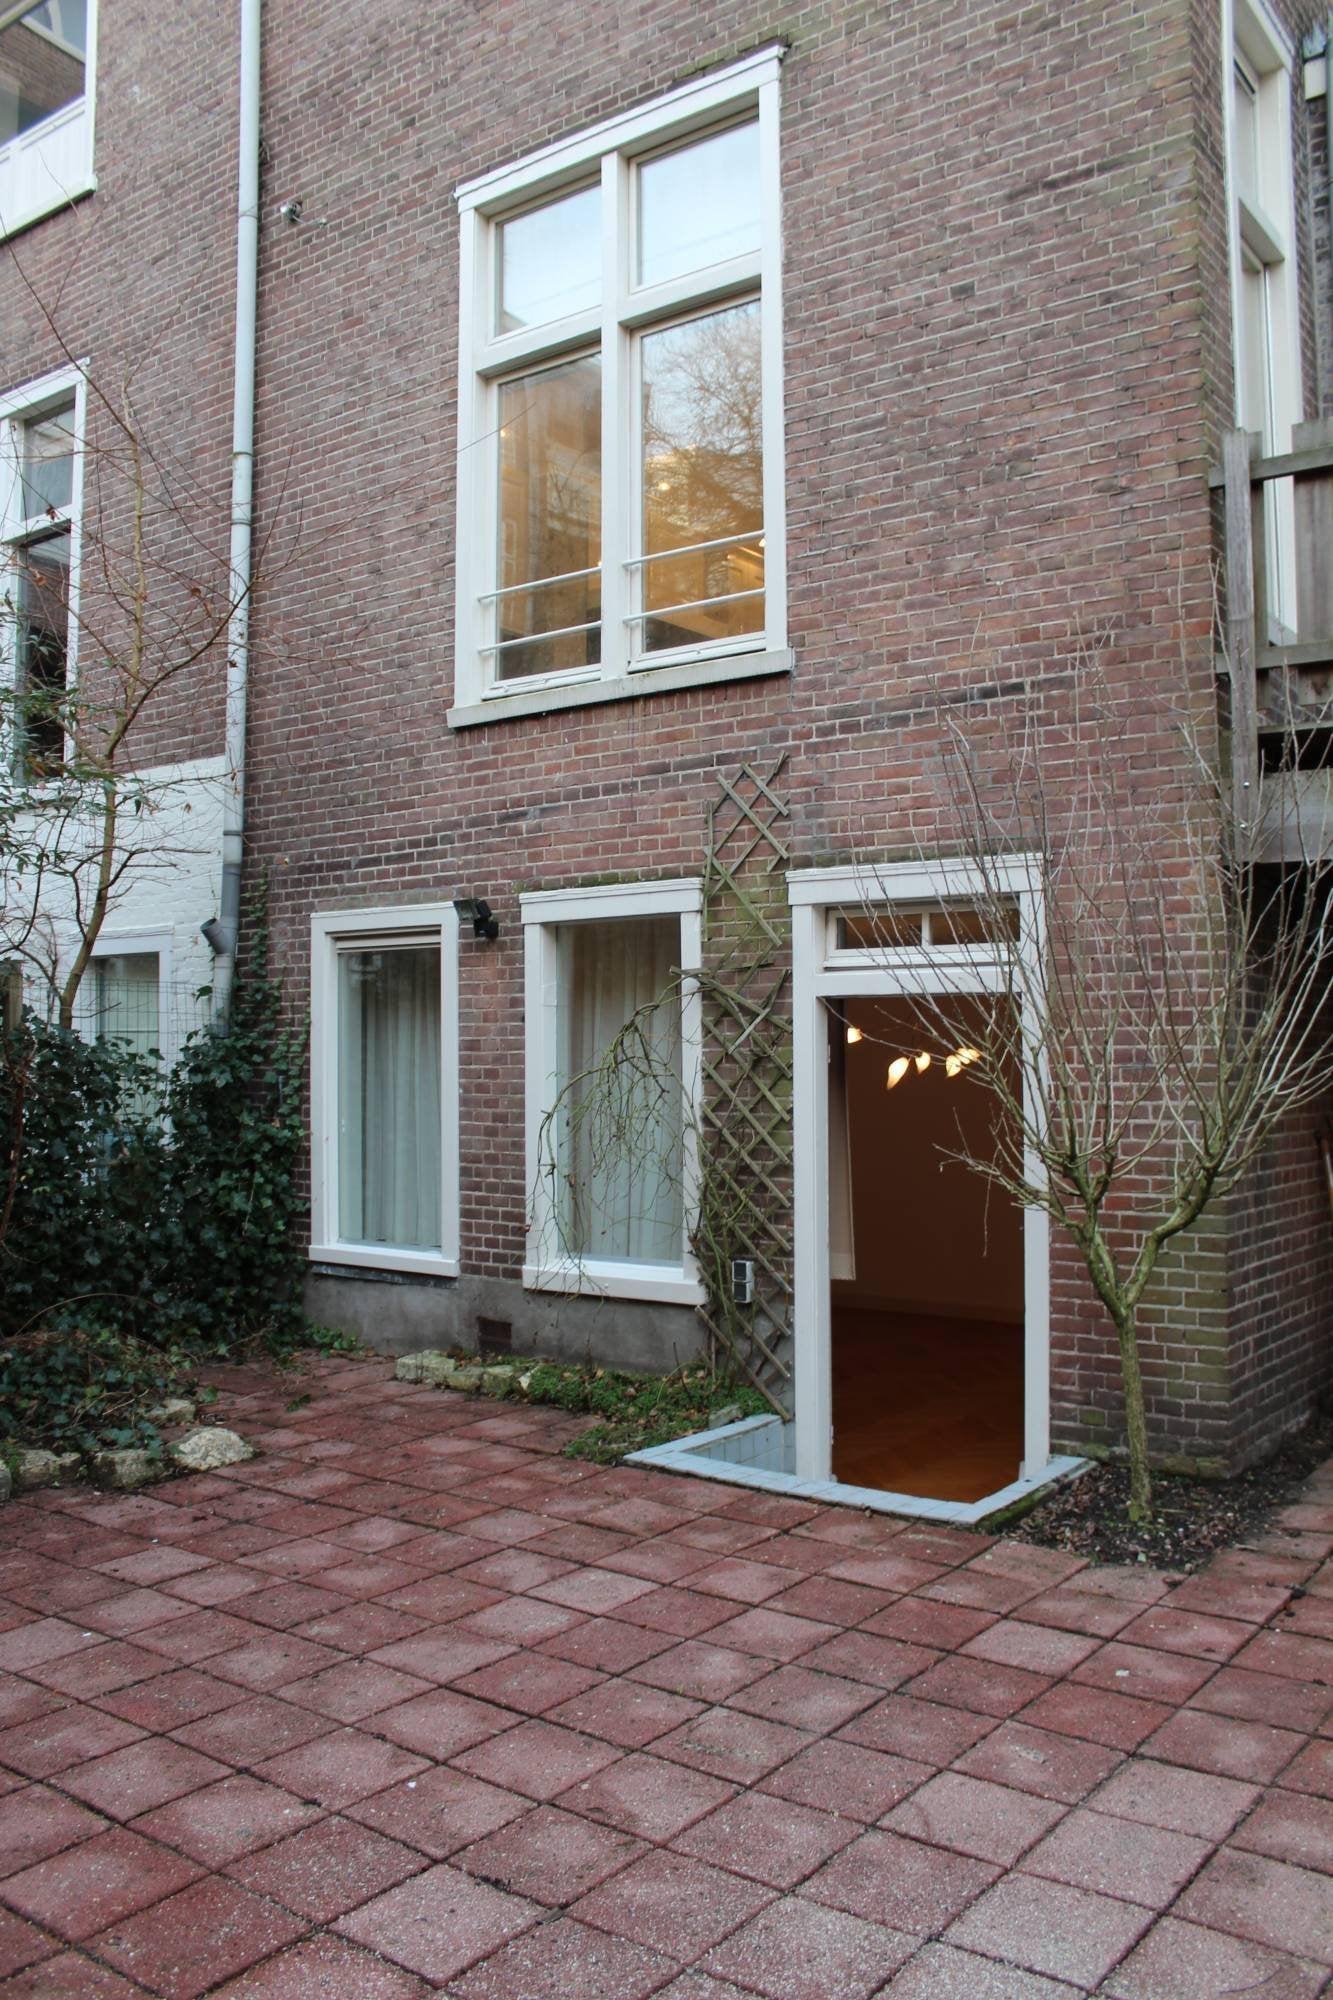 https://public.parariusoffice.nl/15/photos/huge/2742.1464698771-883.JPG